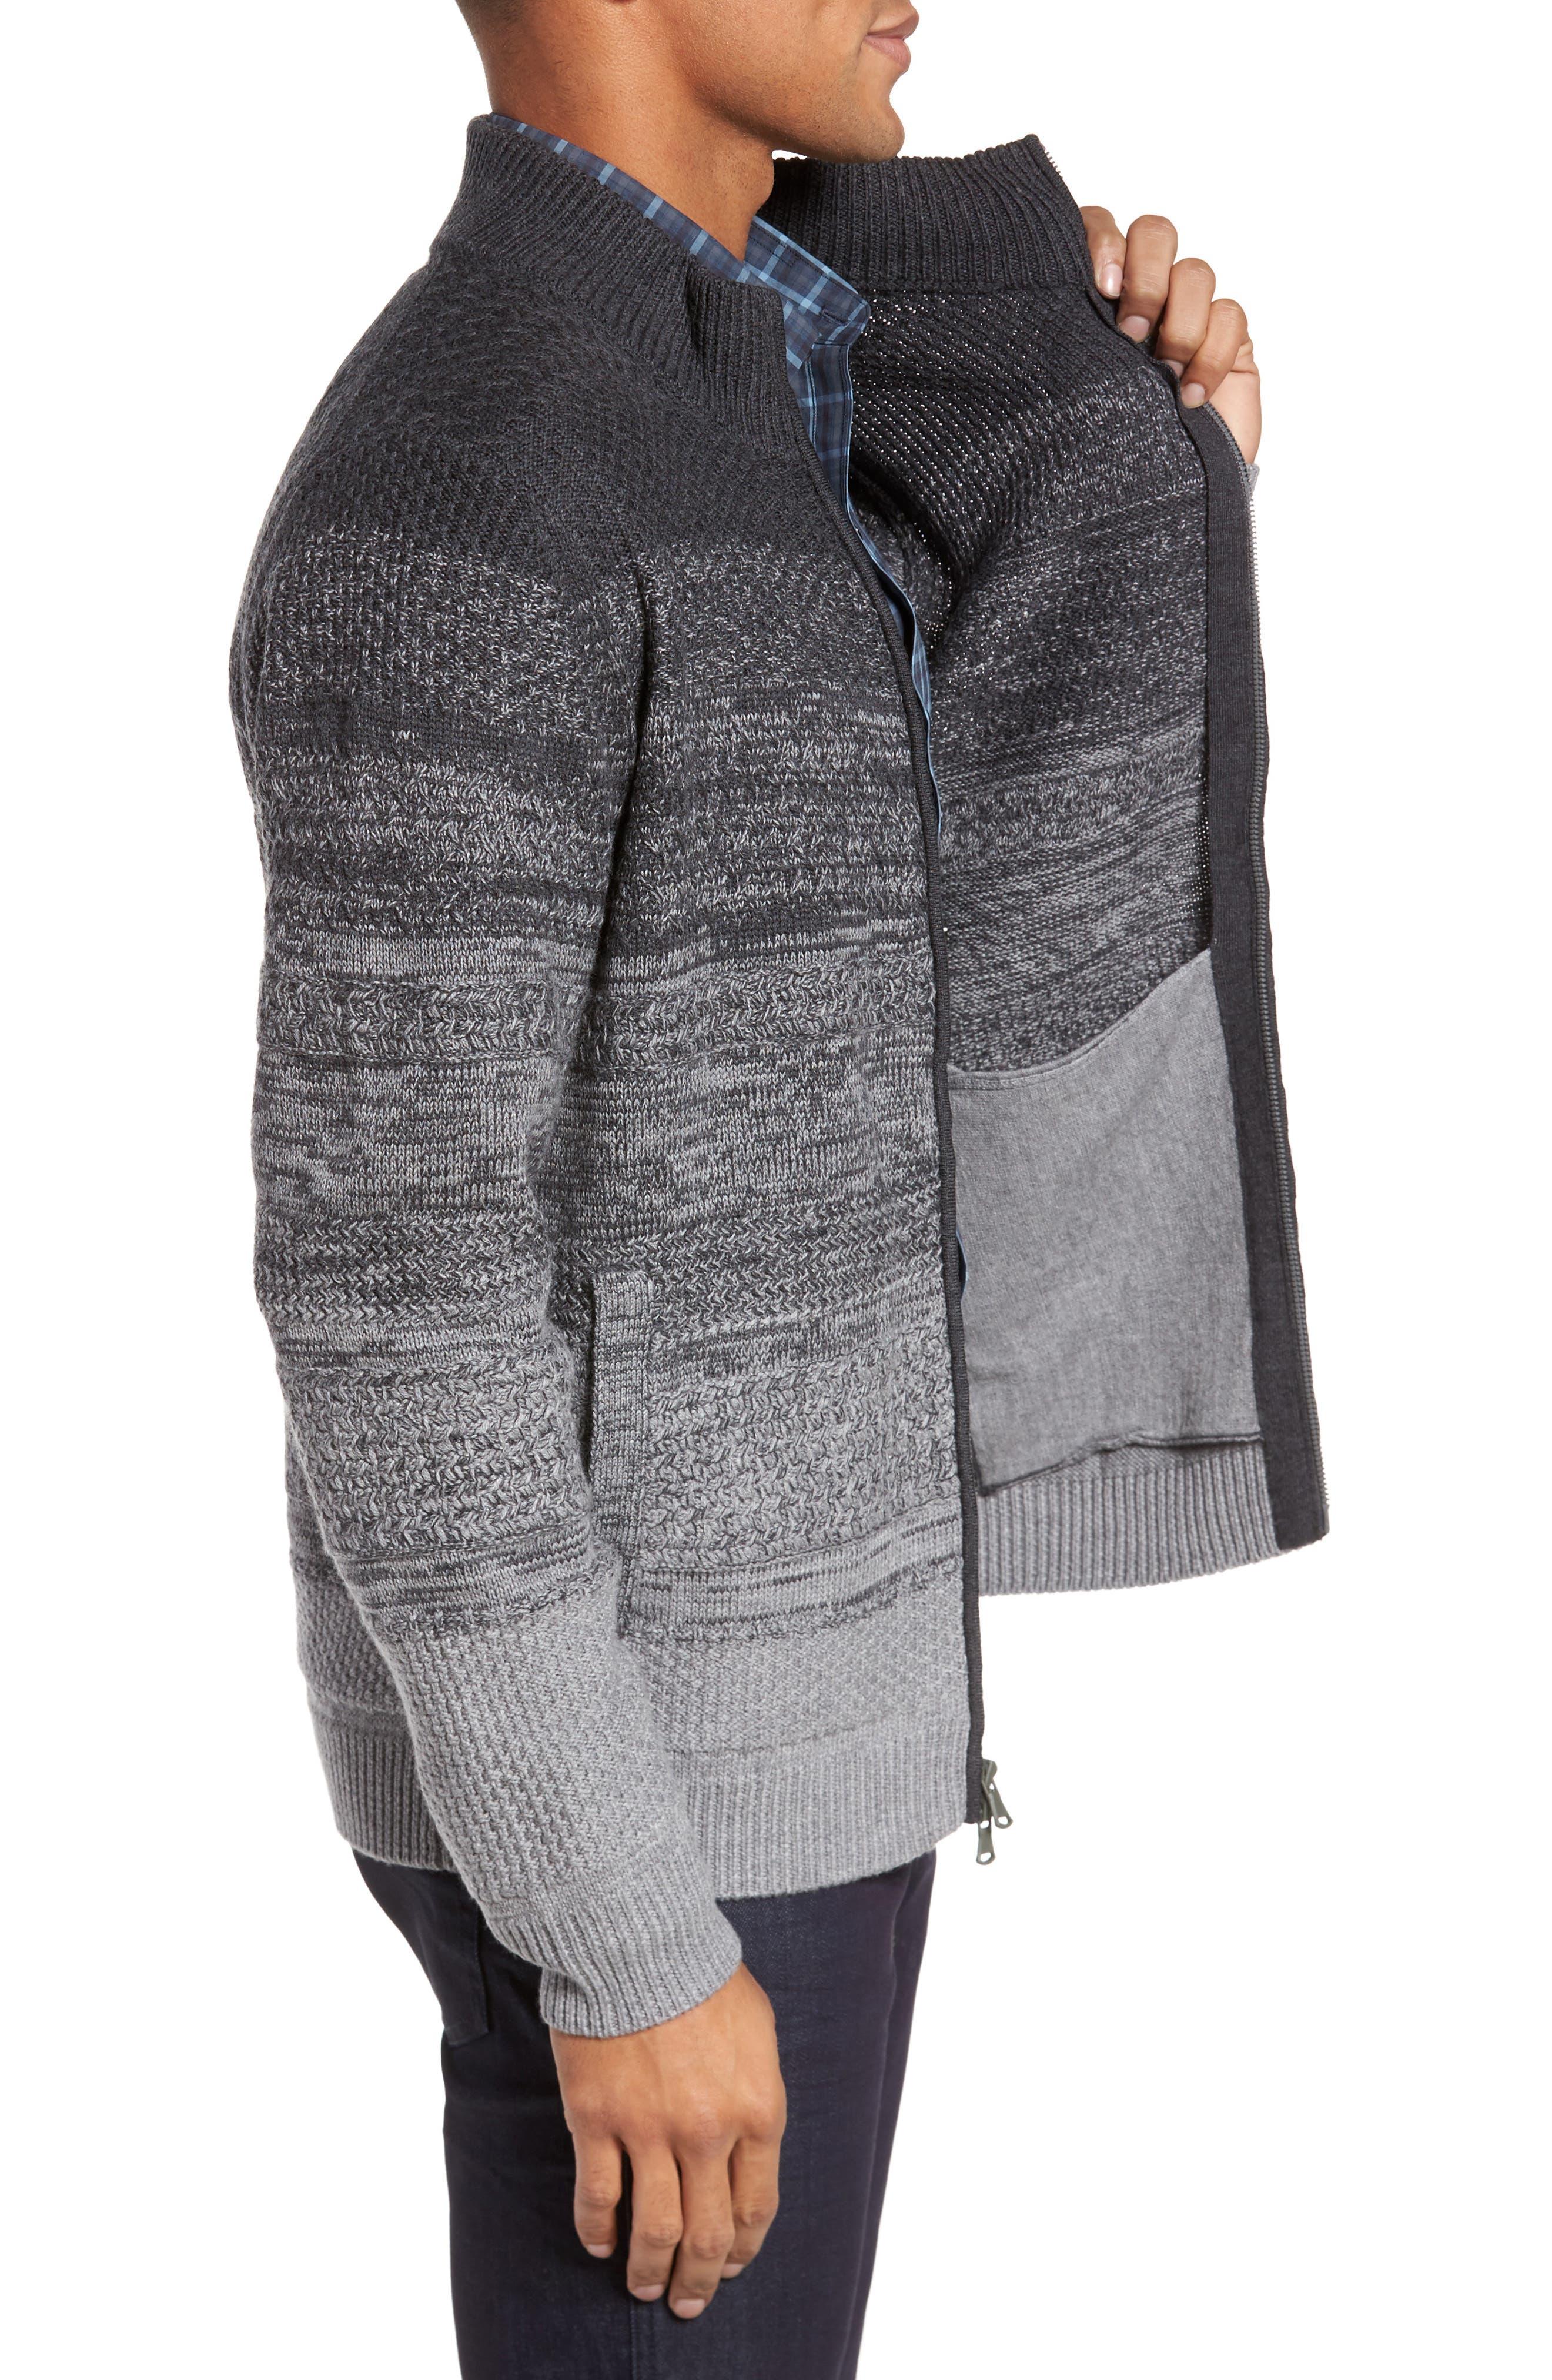 Hawkins Degrade Merino Full Zip Cardigan,                             Alternate thumbnail 3, color,                             Grey